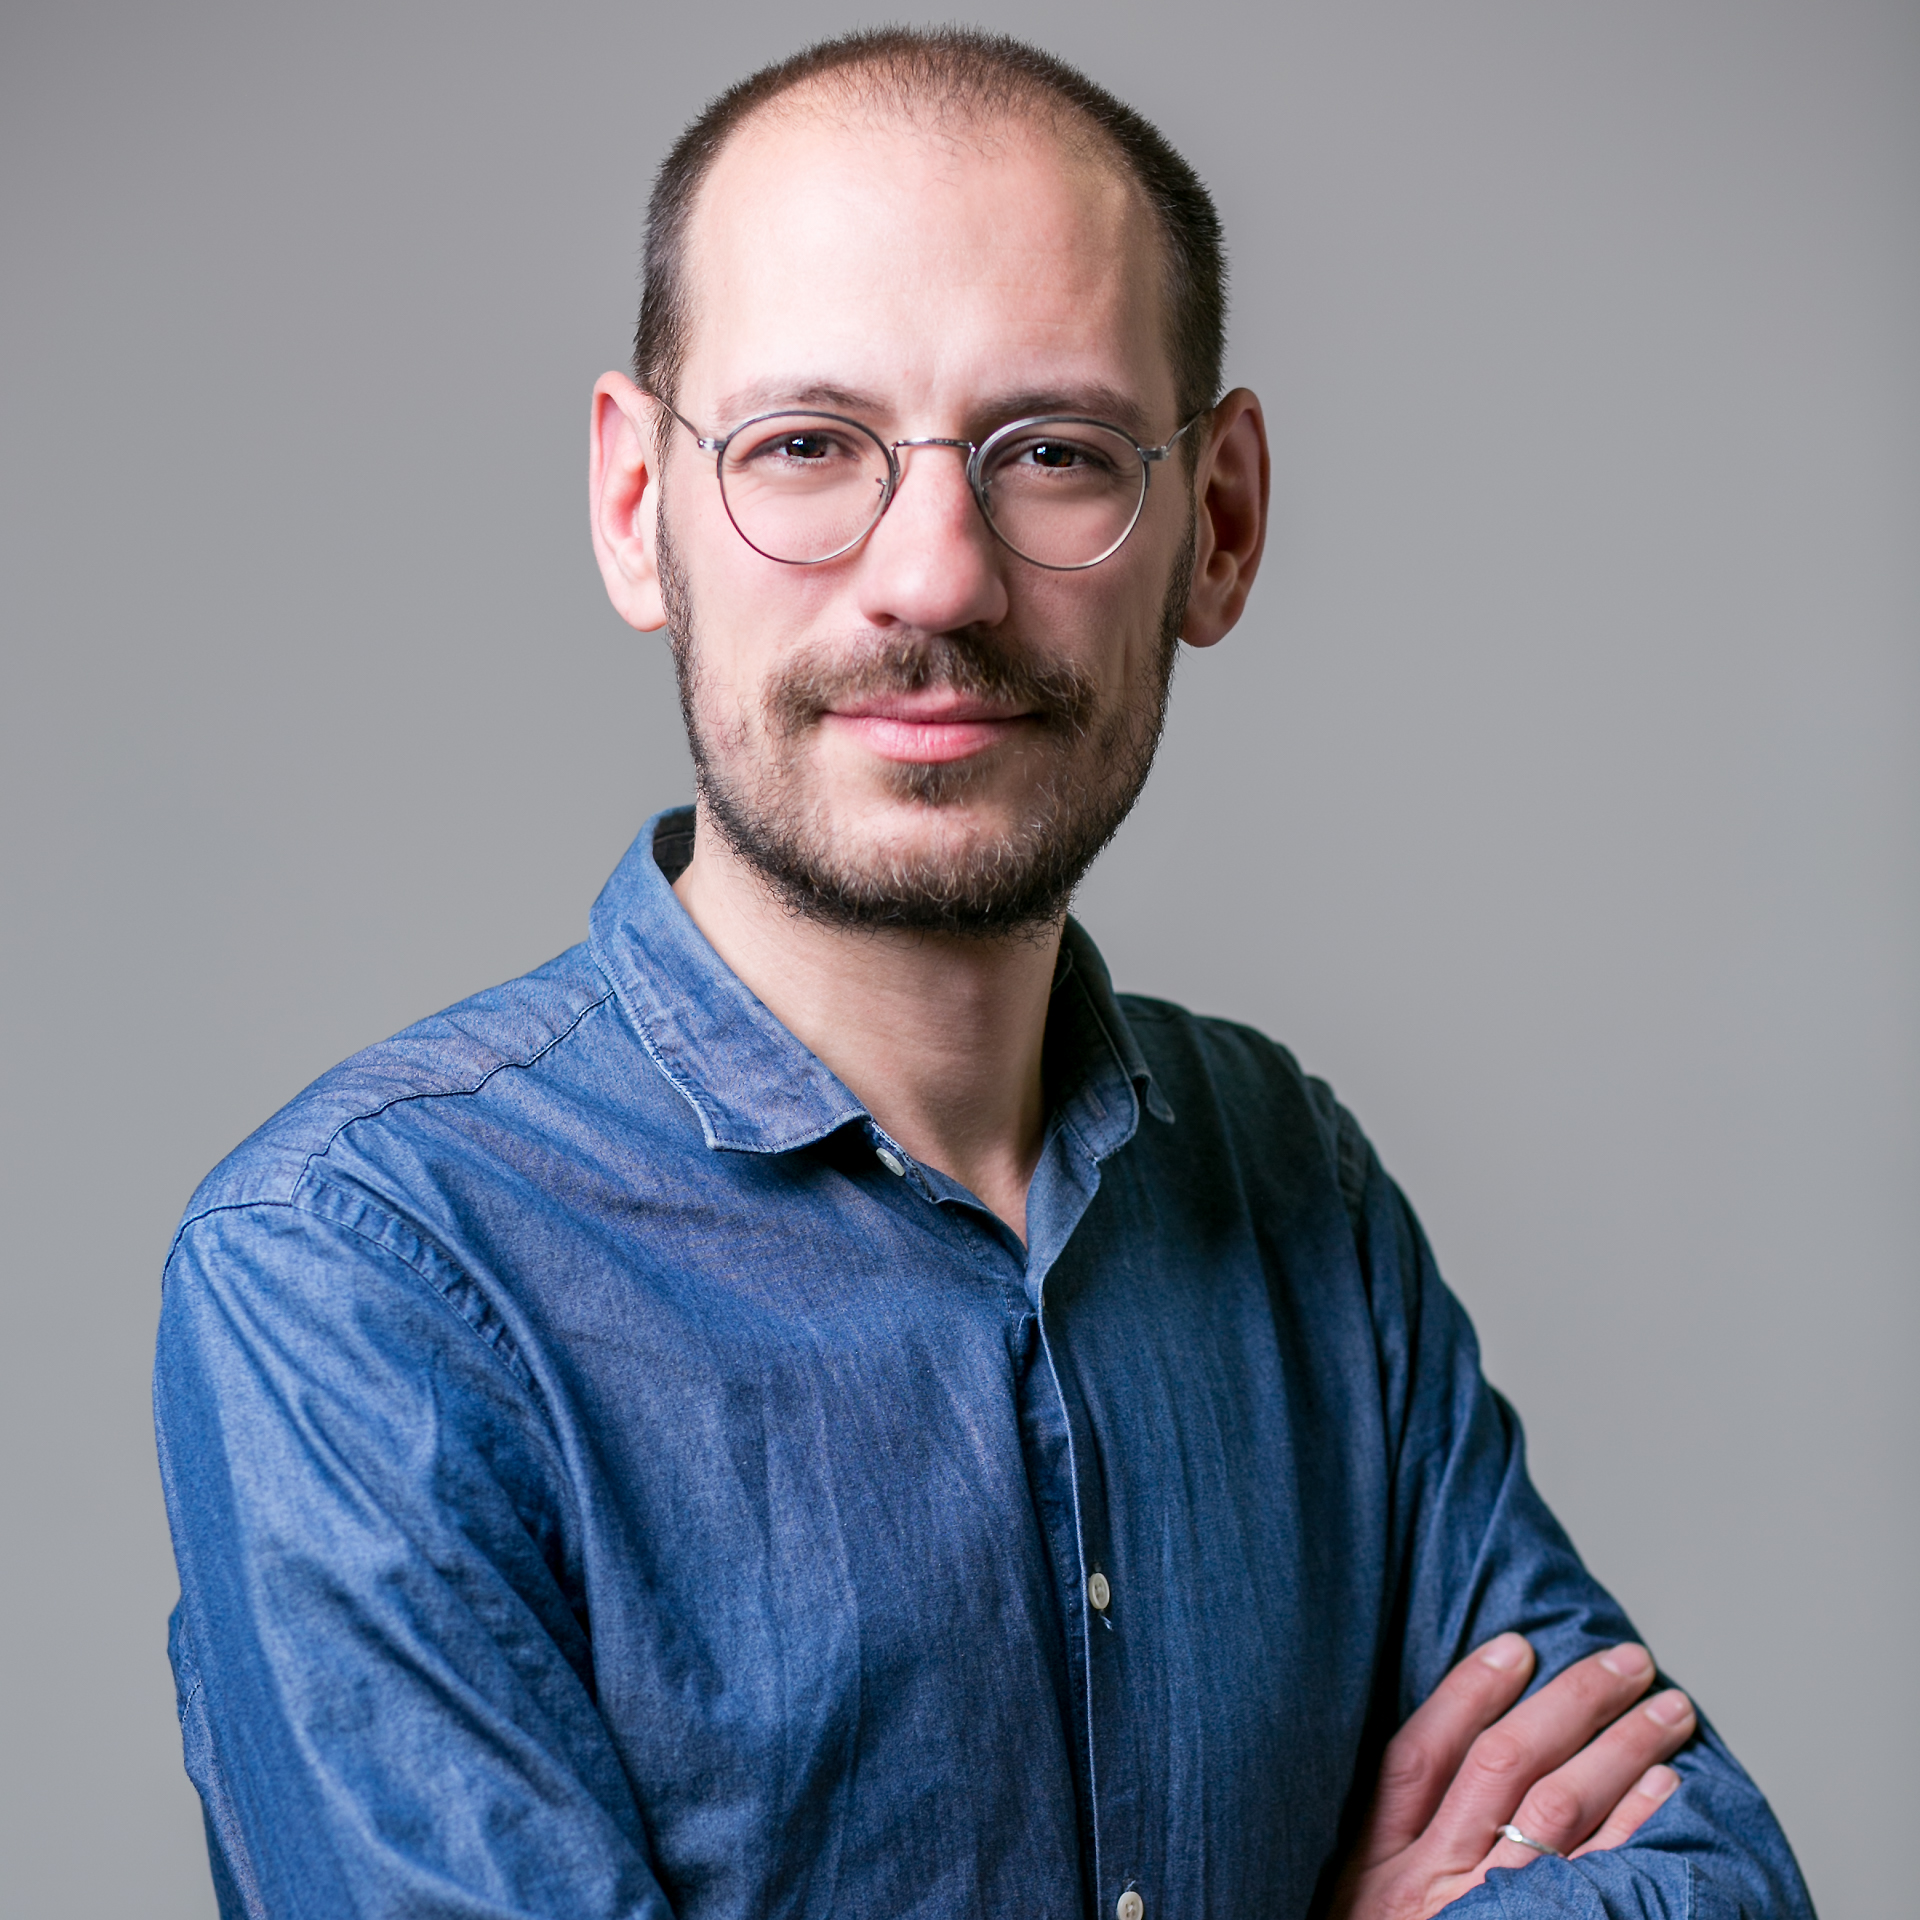 Pierre Esselinck